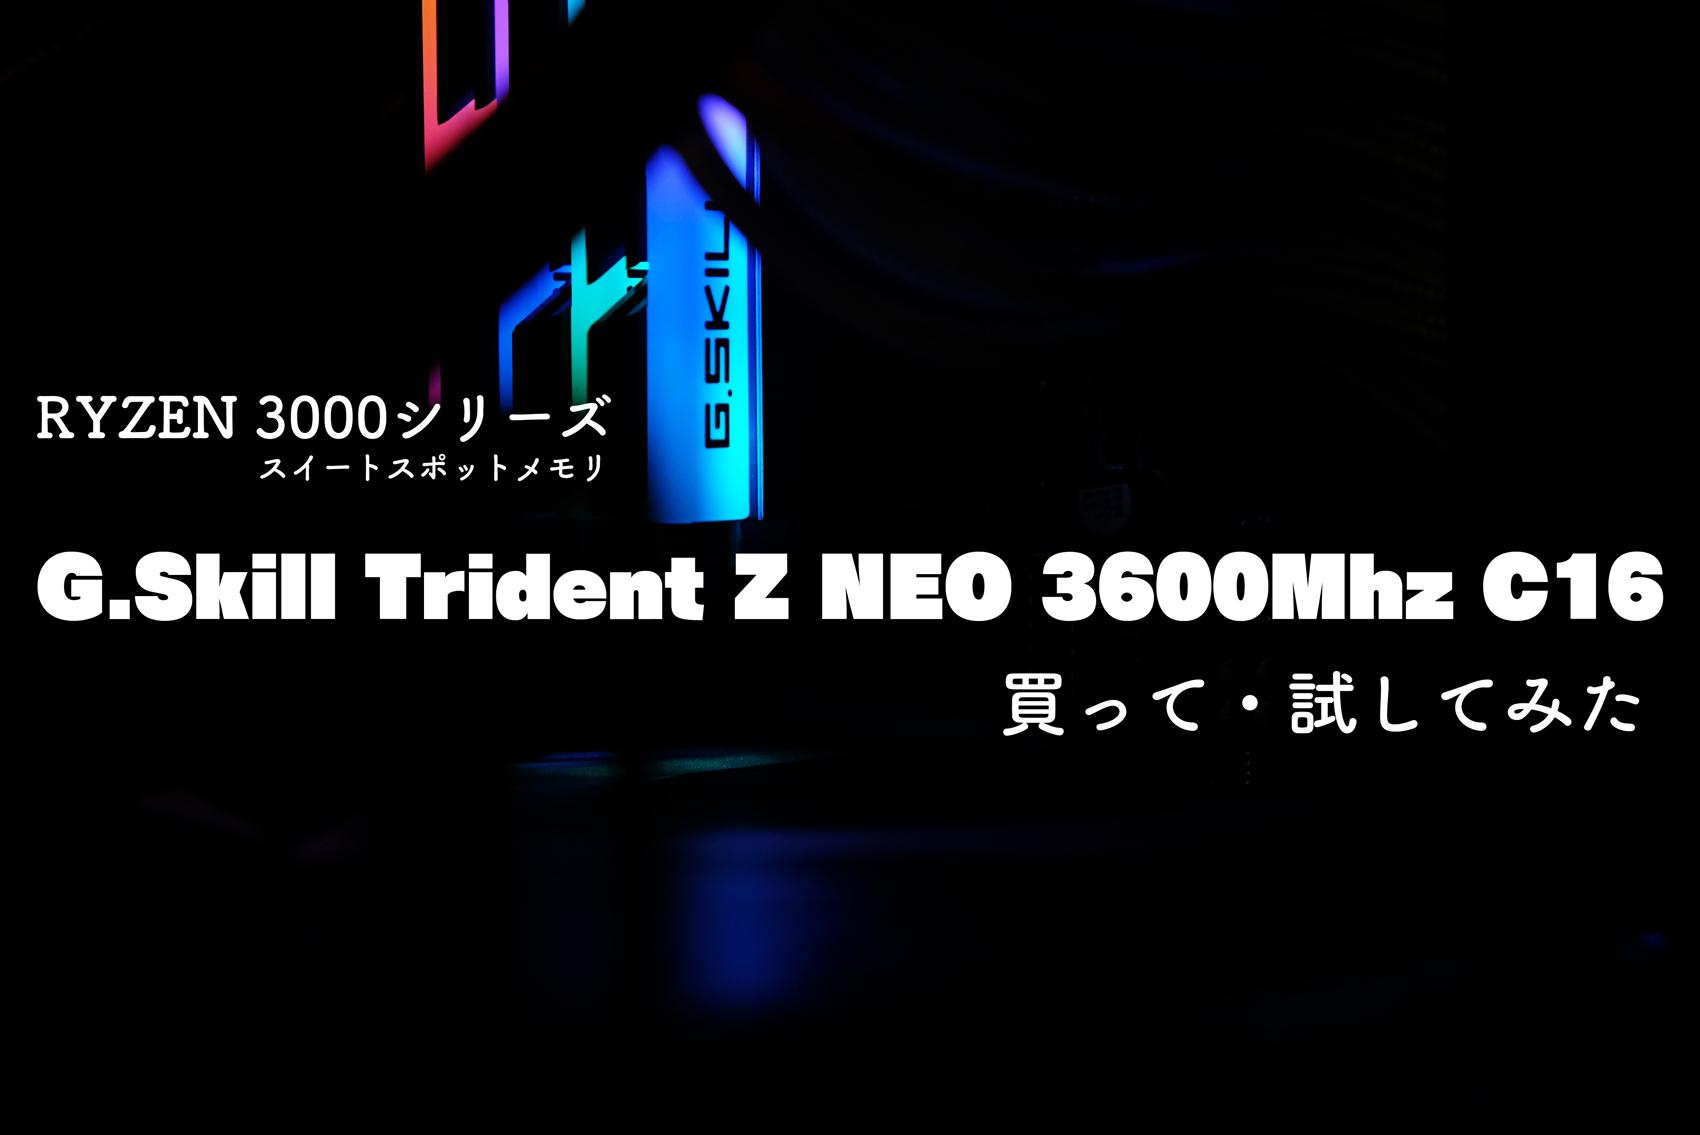 Ryzen 3000シリーズに最適なメモリ「G.Skill Trident Z Neo 3600hz C16」買って・試してみた【レビュー】